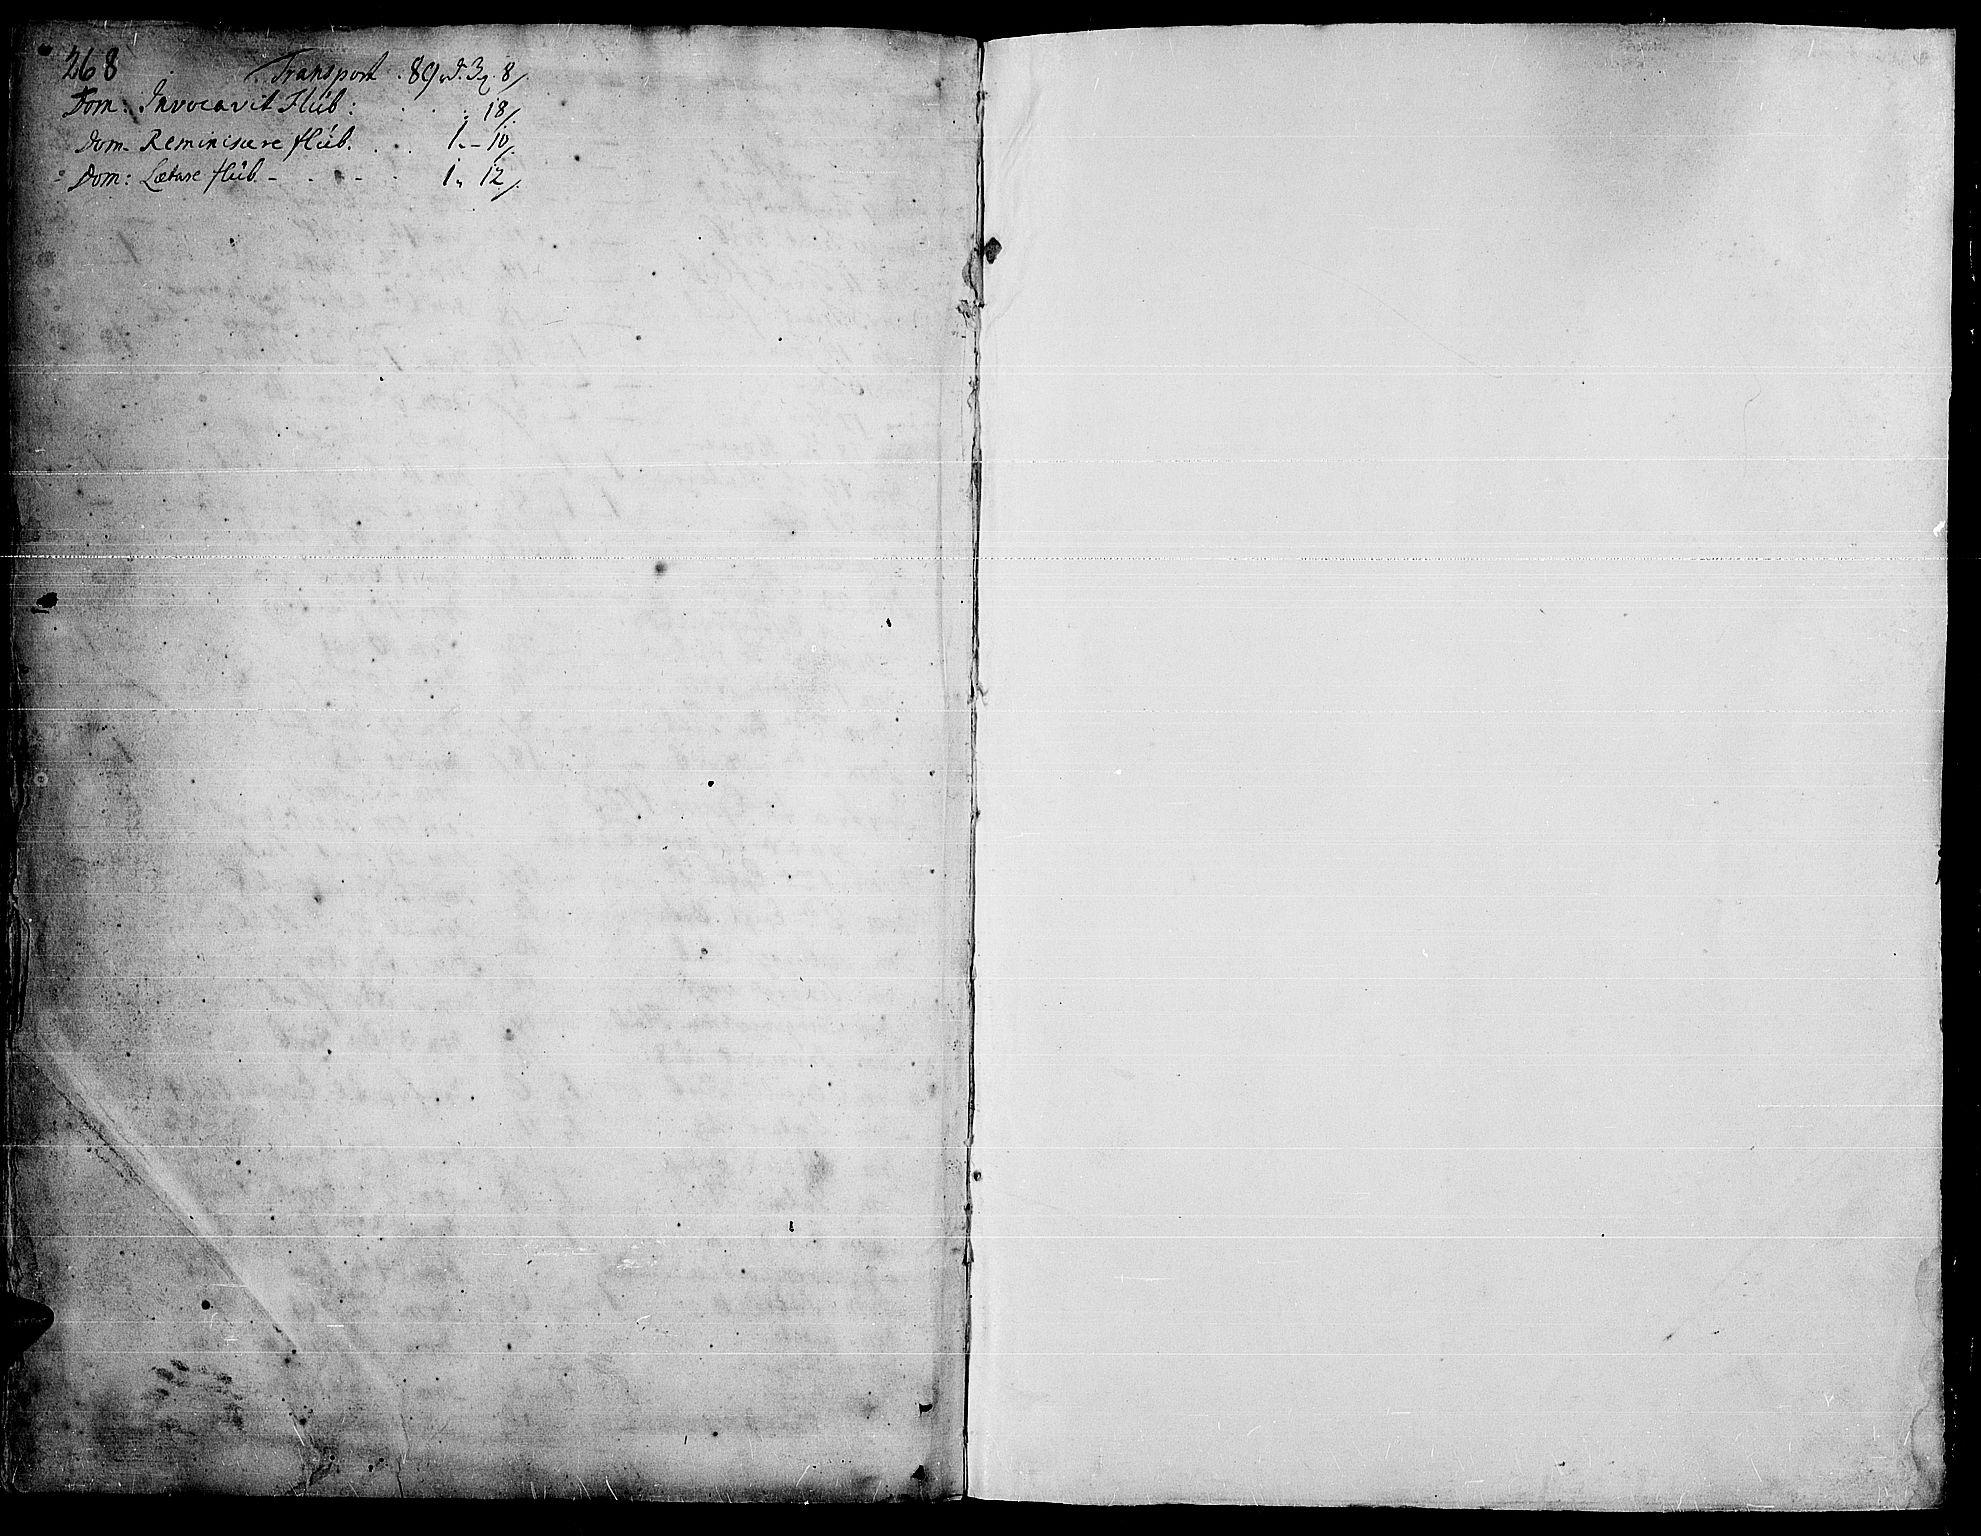 SAH, Land prestekontor, Ministerialbok nr. 1, 1708-1732, s. 268-269